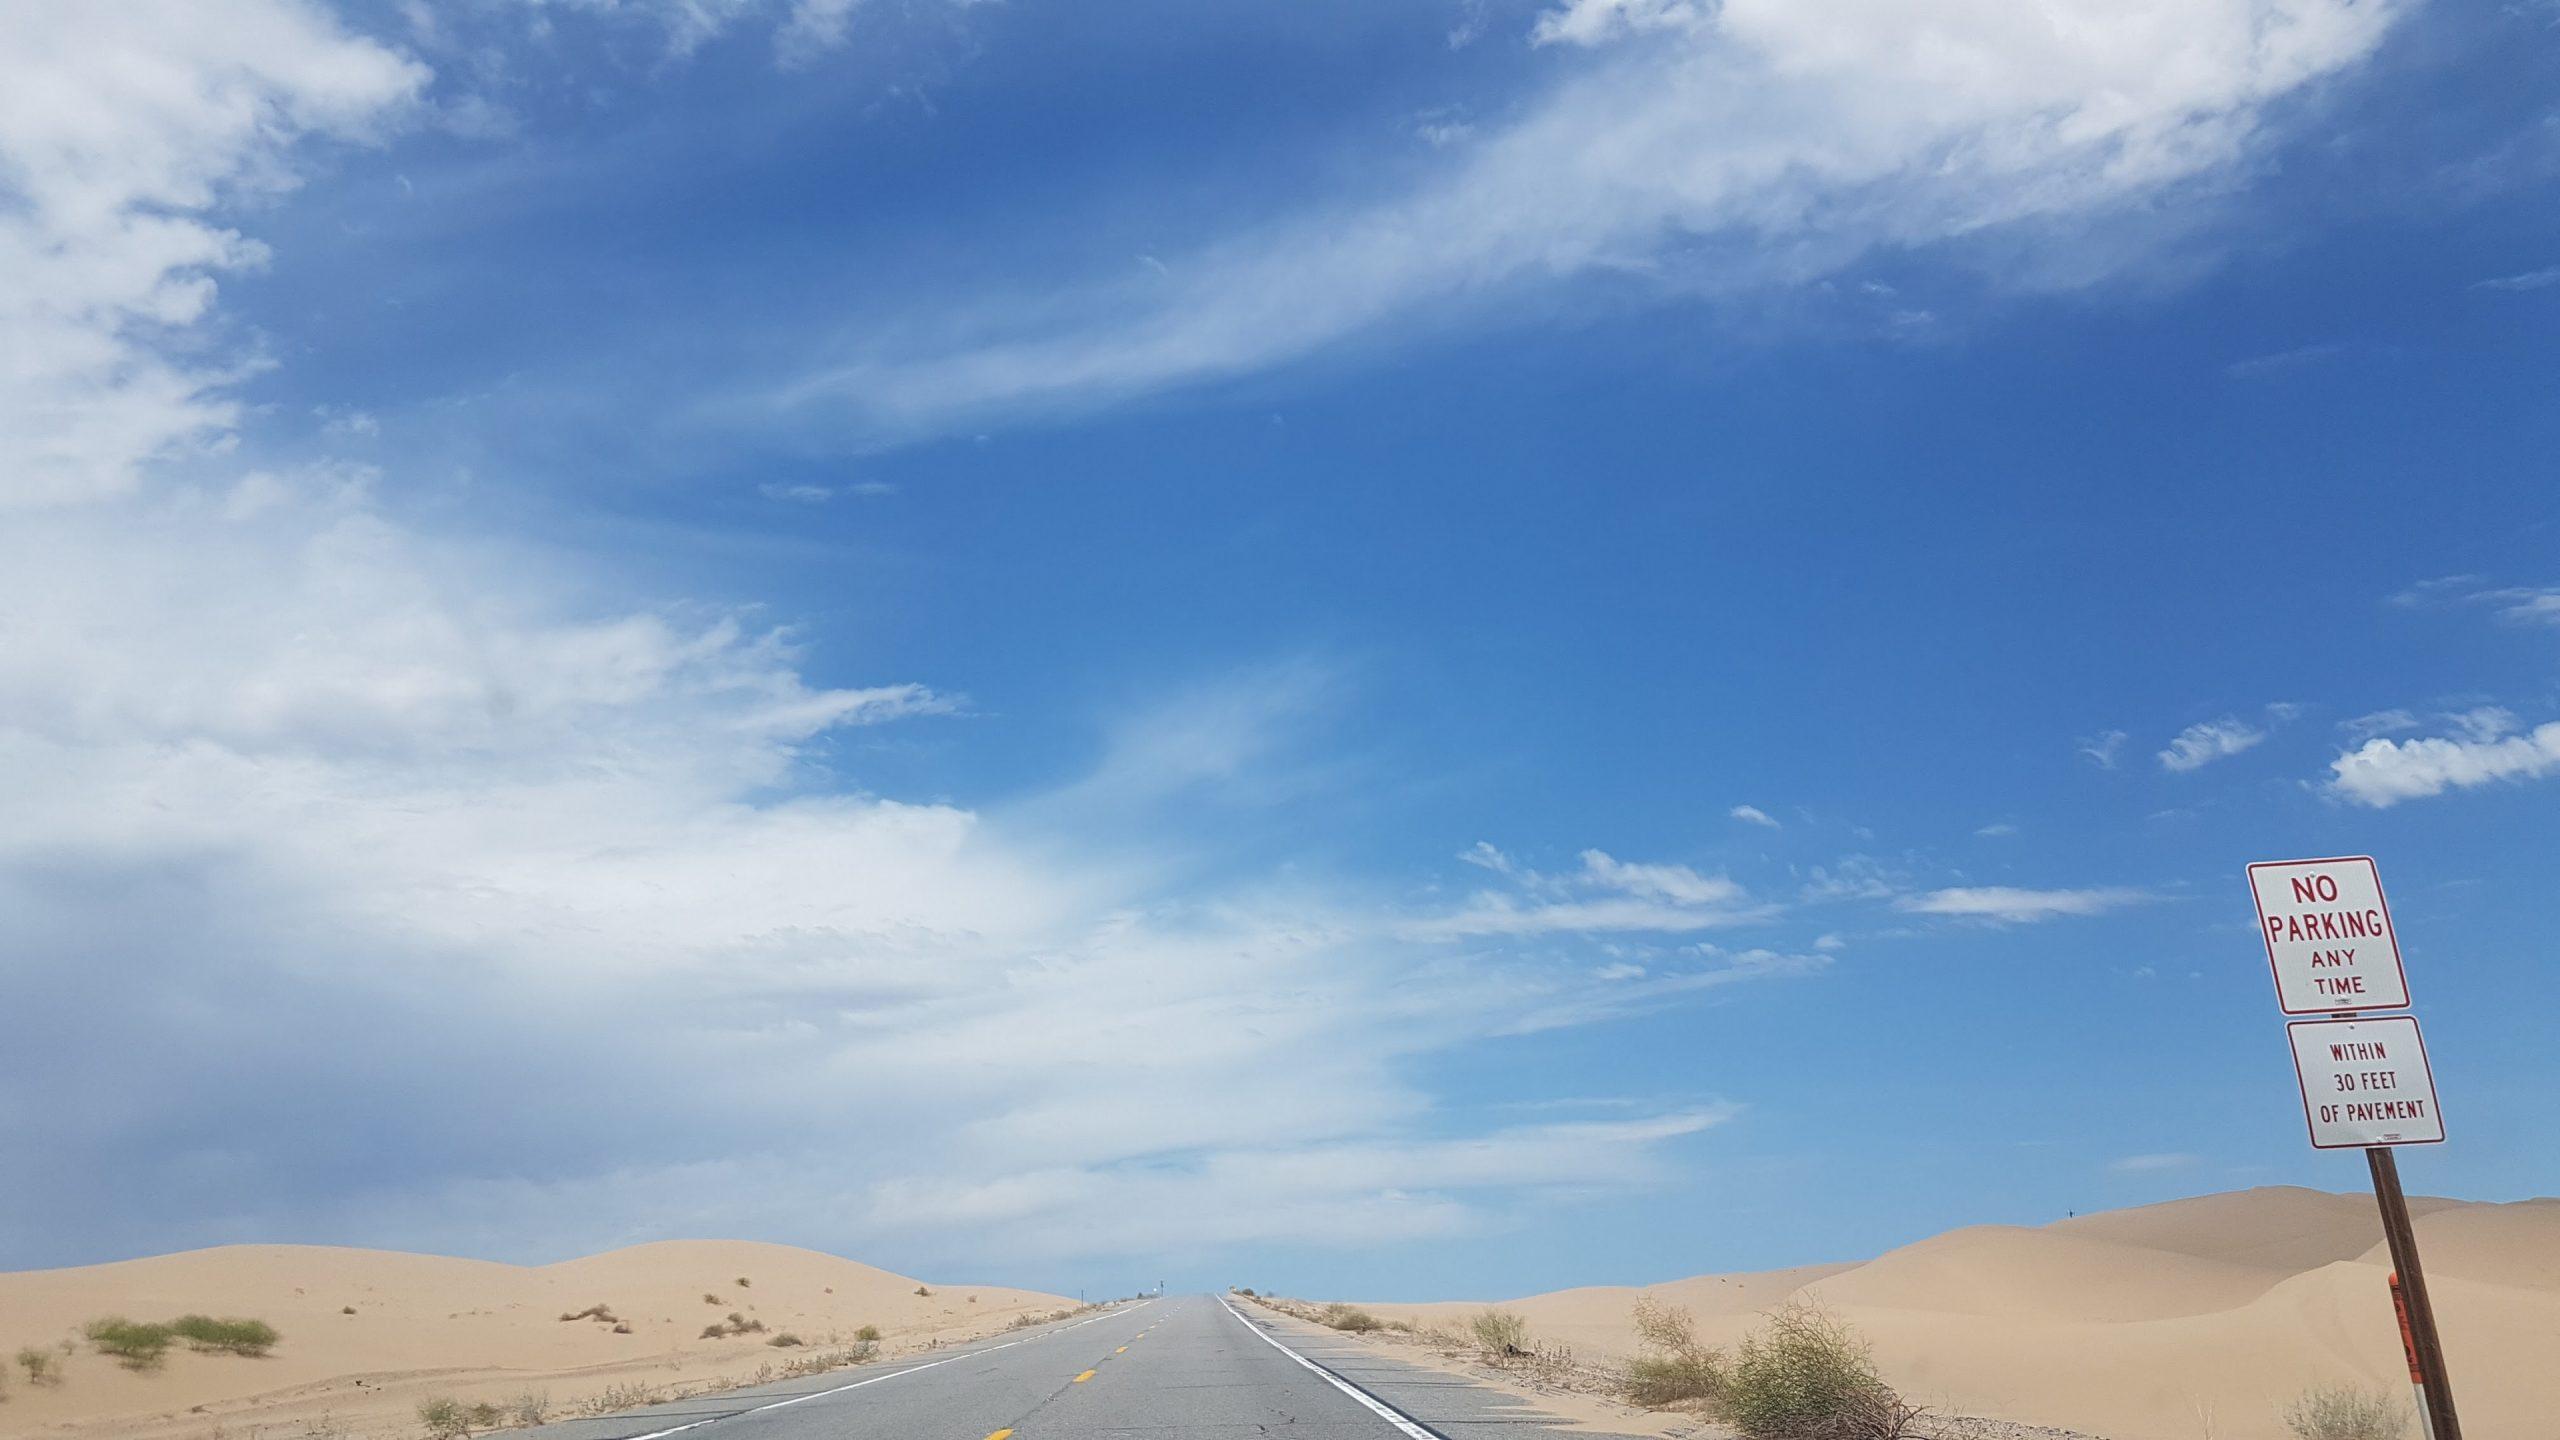 Imperial Sand Dunes, Juli 2017.